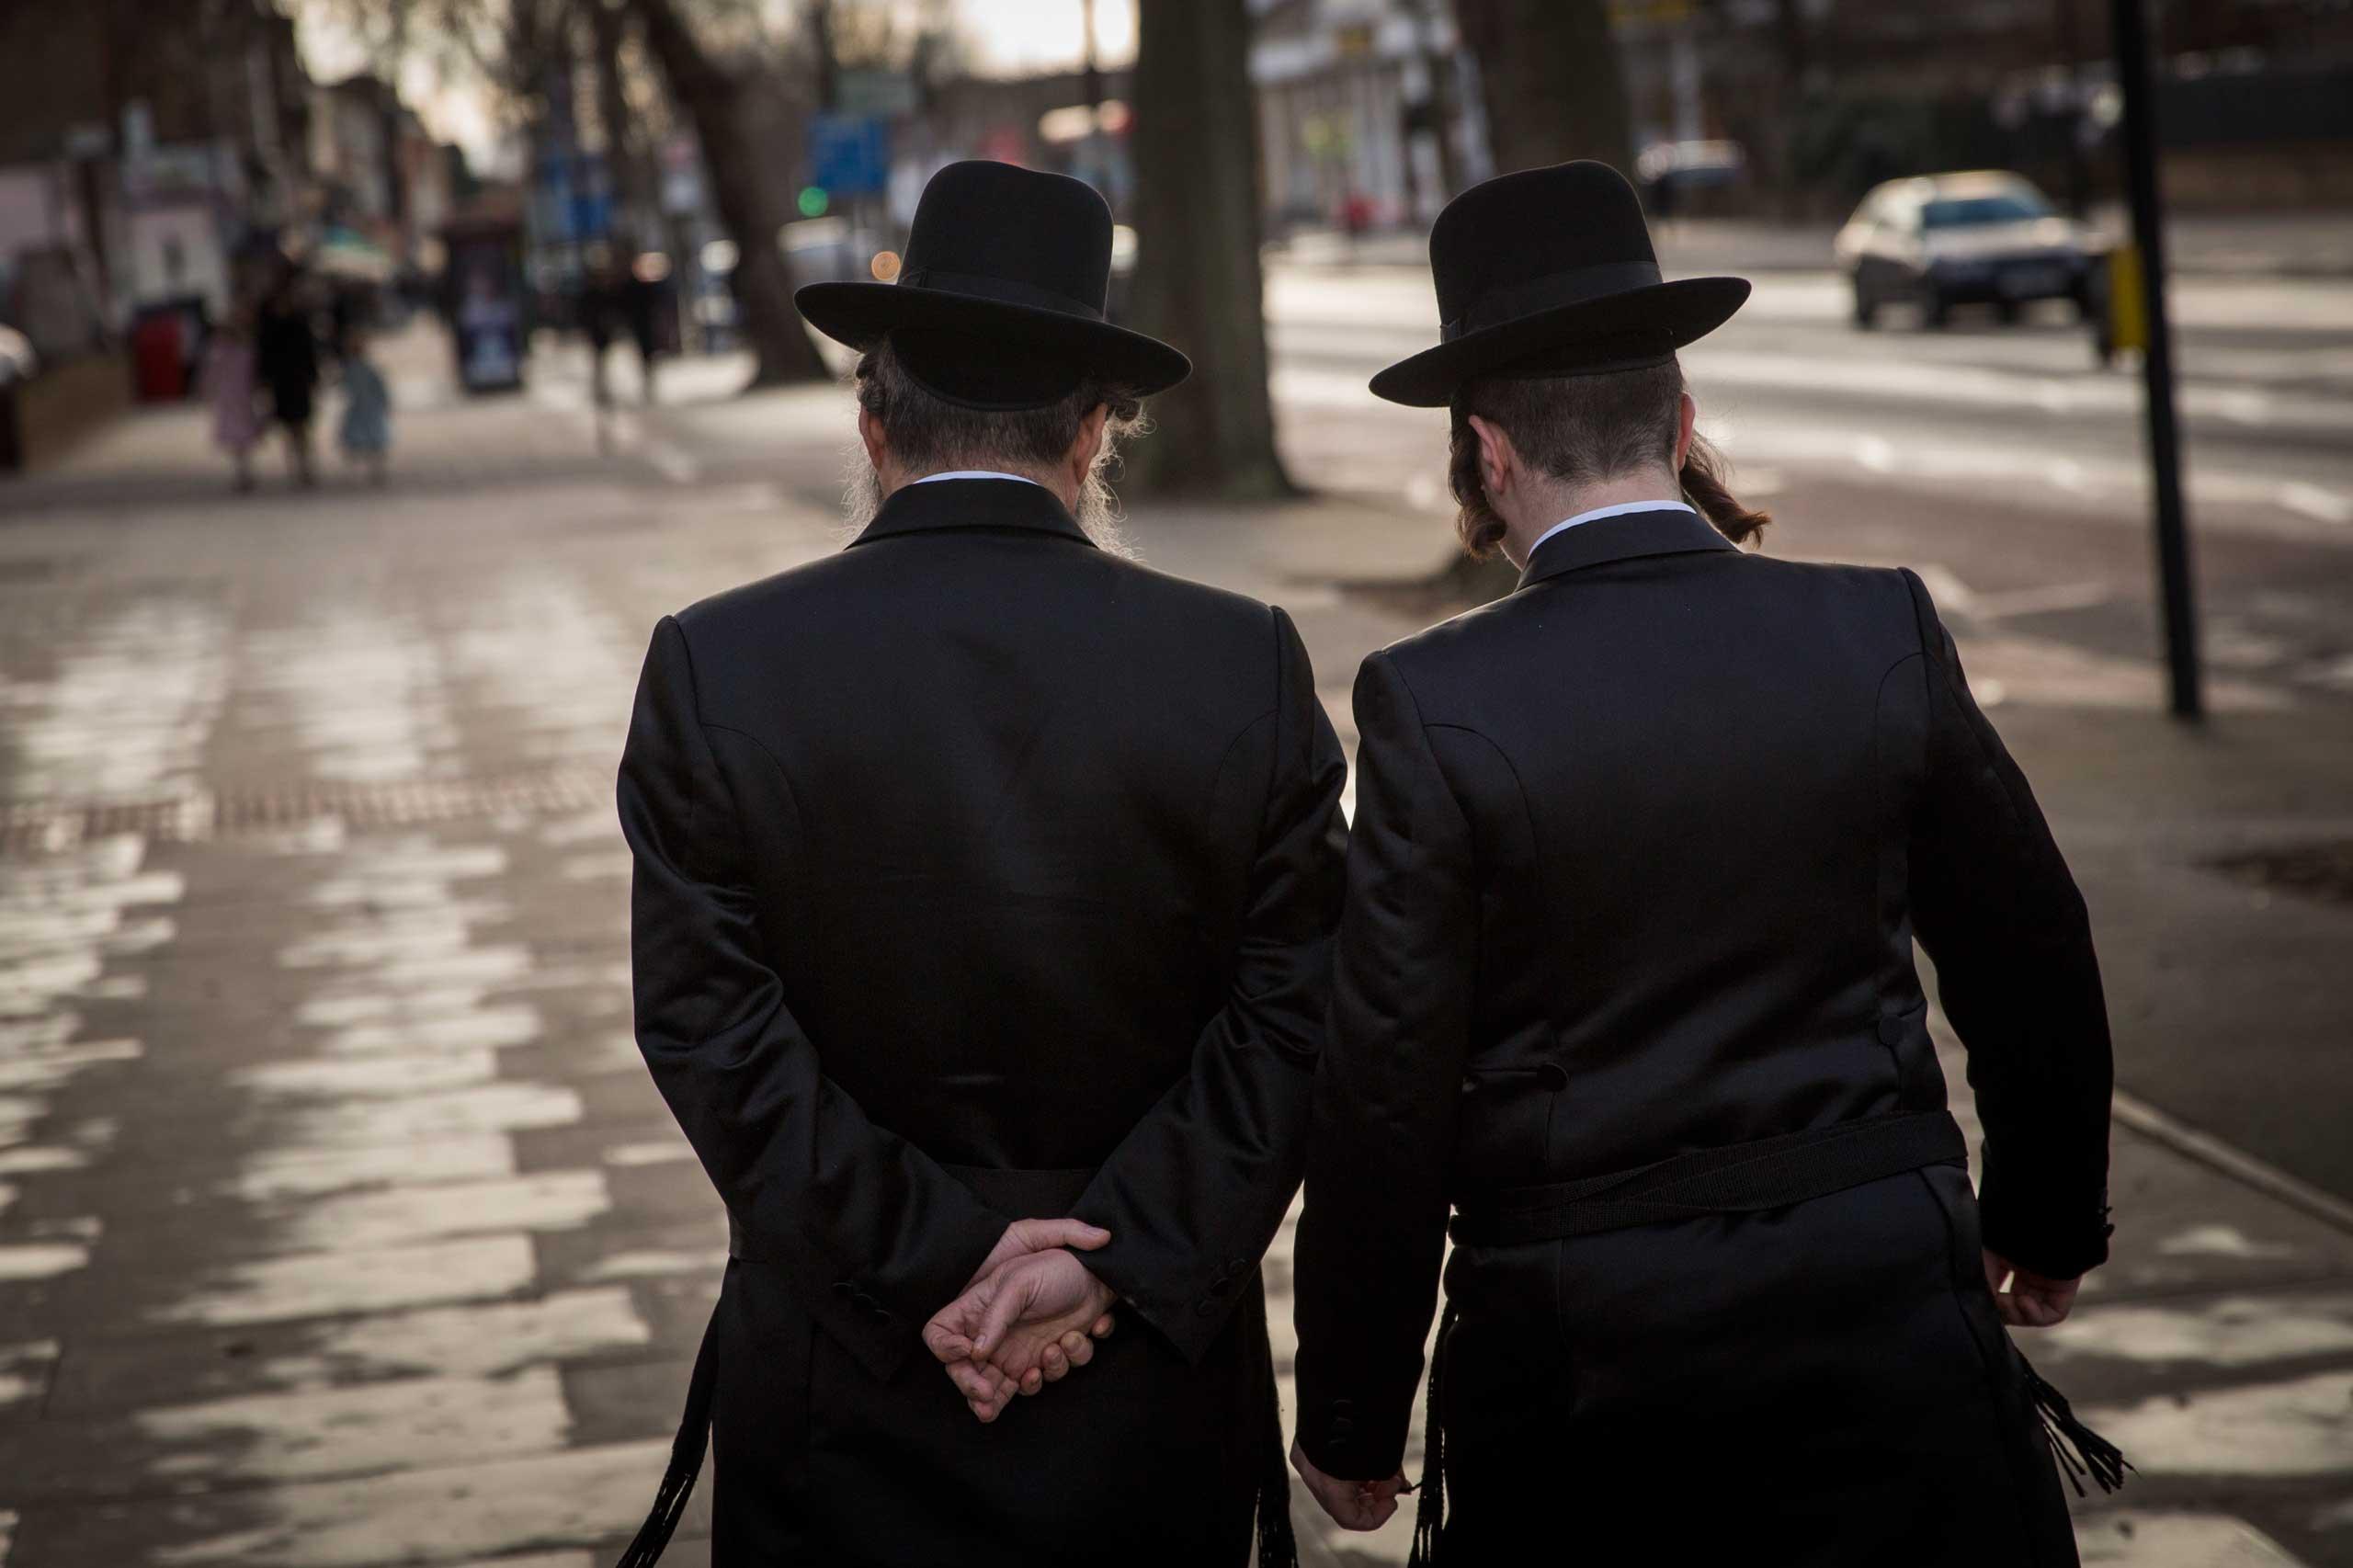 Ultra-orthodox Jewish men walk along the street in the Stamford Hill area of London on Jan. 17, 2015.